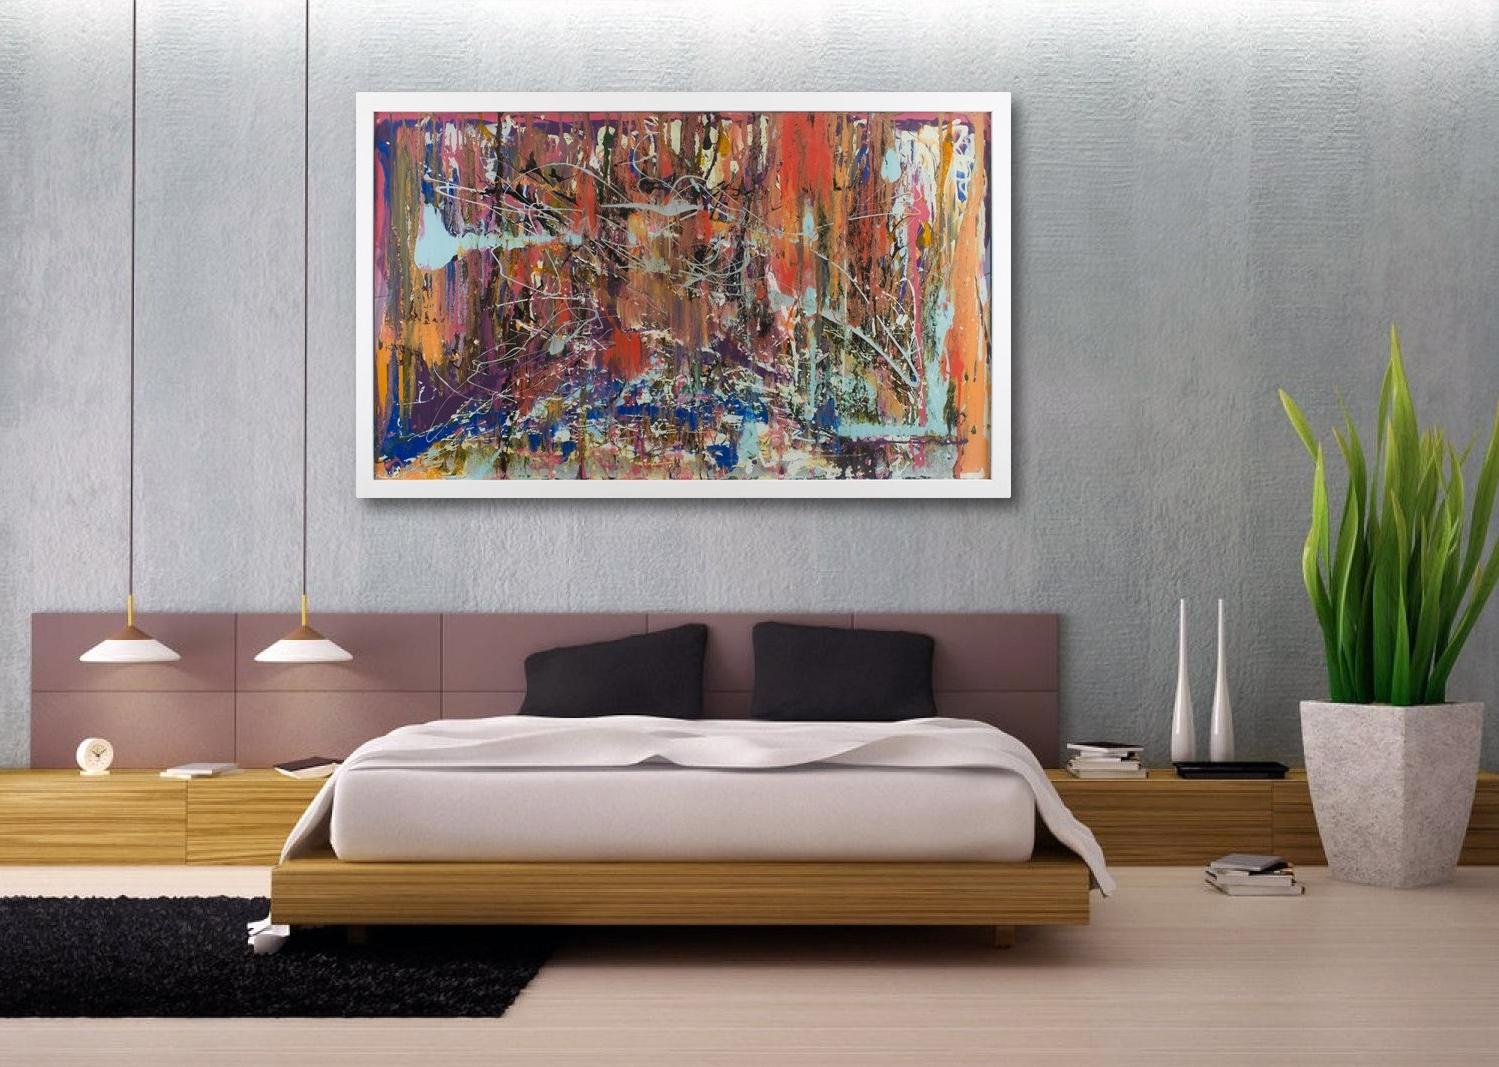 Modern Canvas Wall Art Inside Popular Expensive Large Canvas Wall Art Bedroom — Joanne Russo Homesjoanne (View 11 of 15)